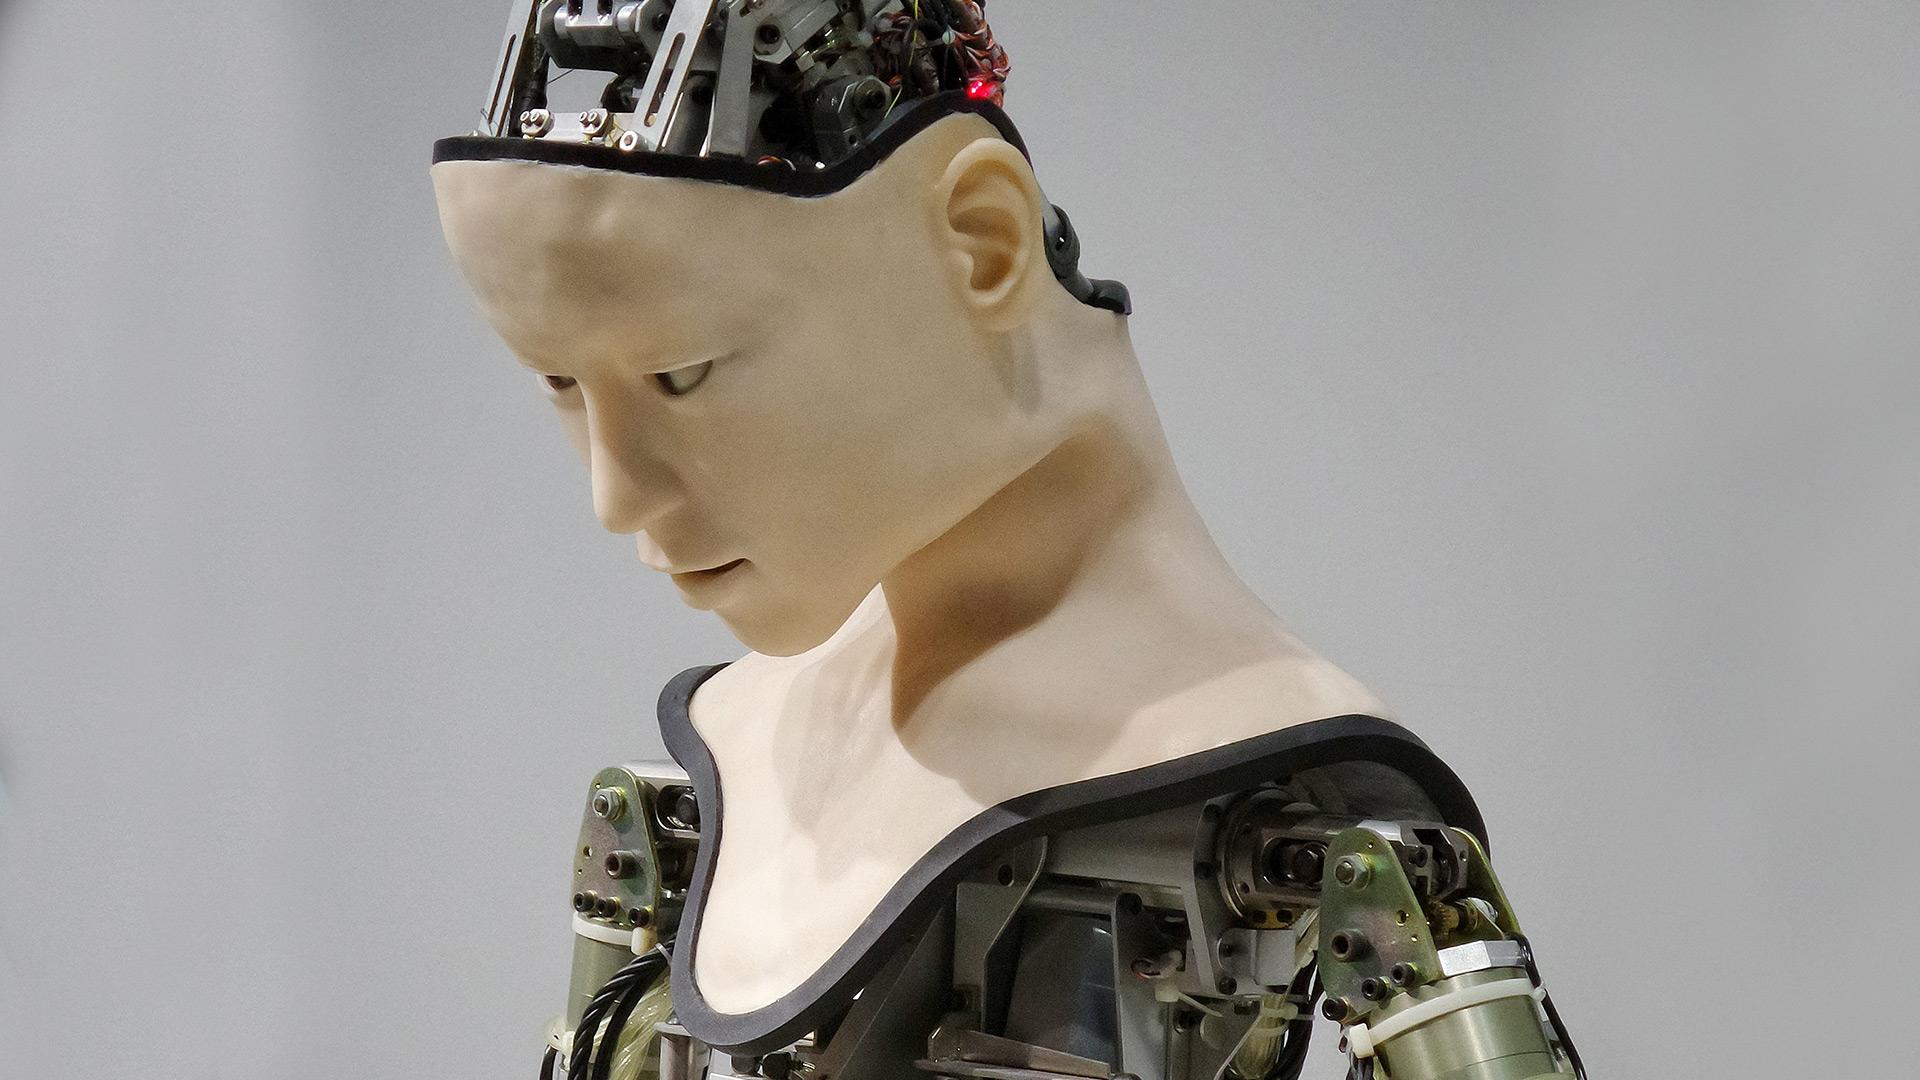 Photo robot androide - IA et monde du travail - Franck V